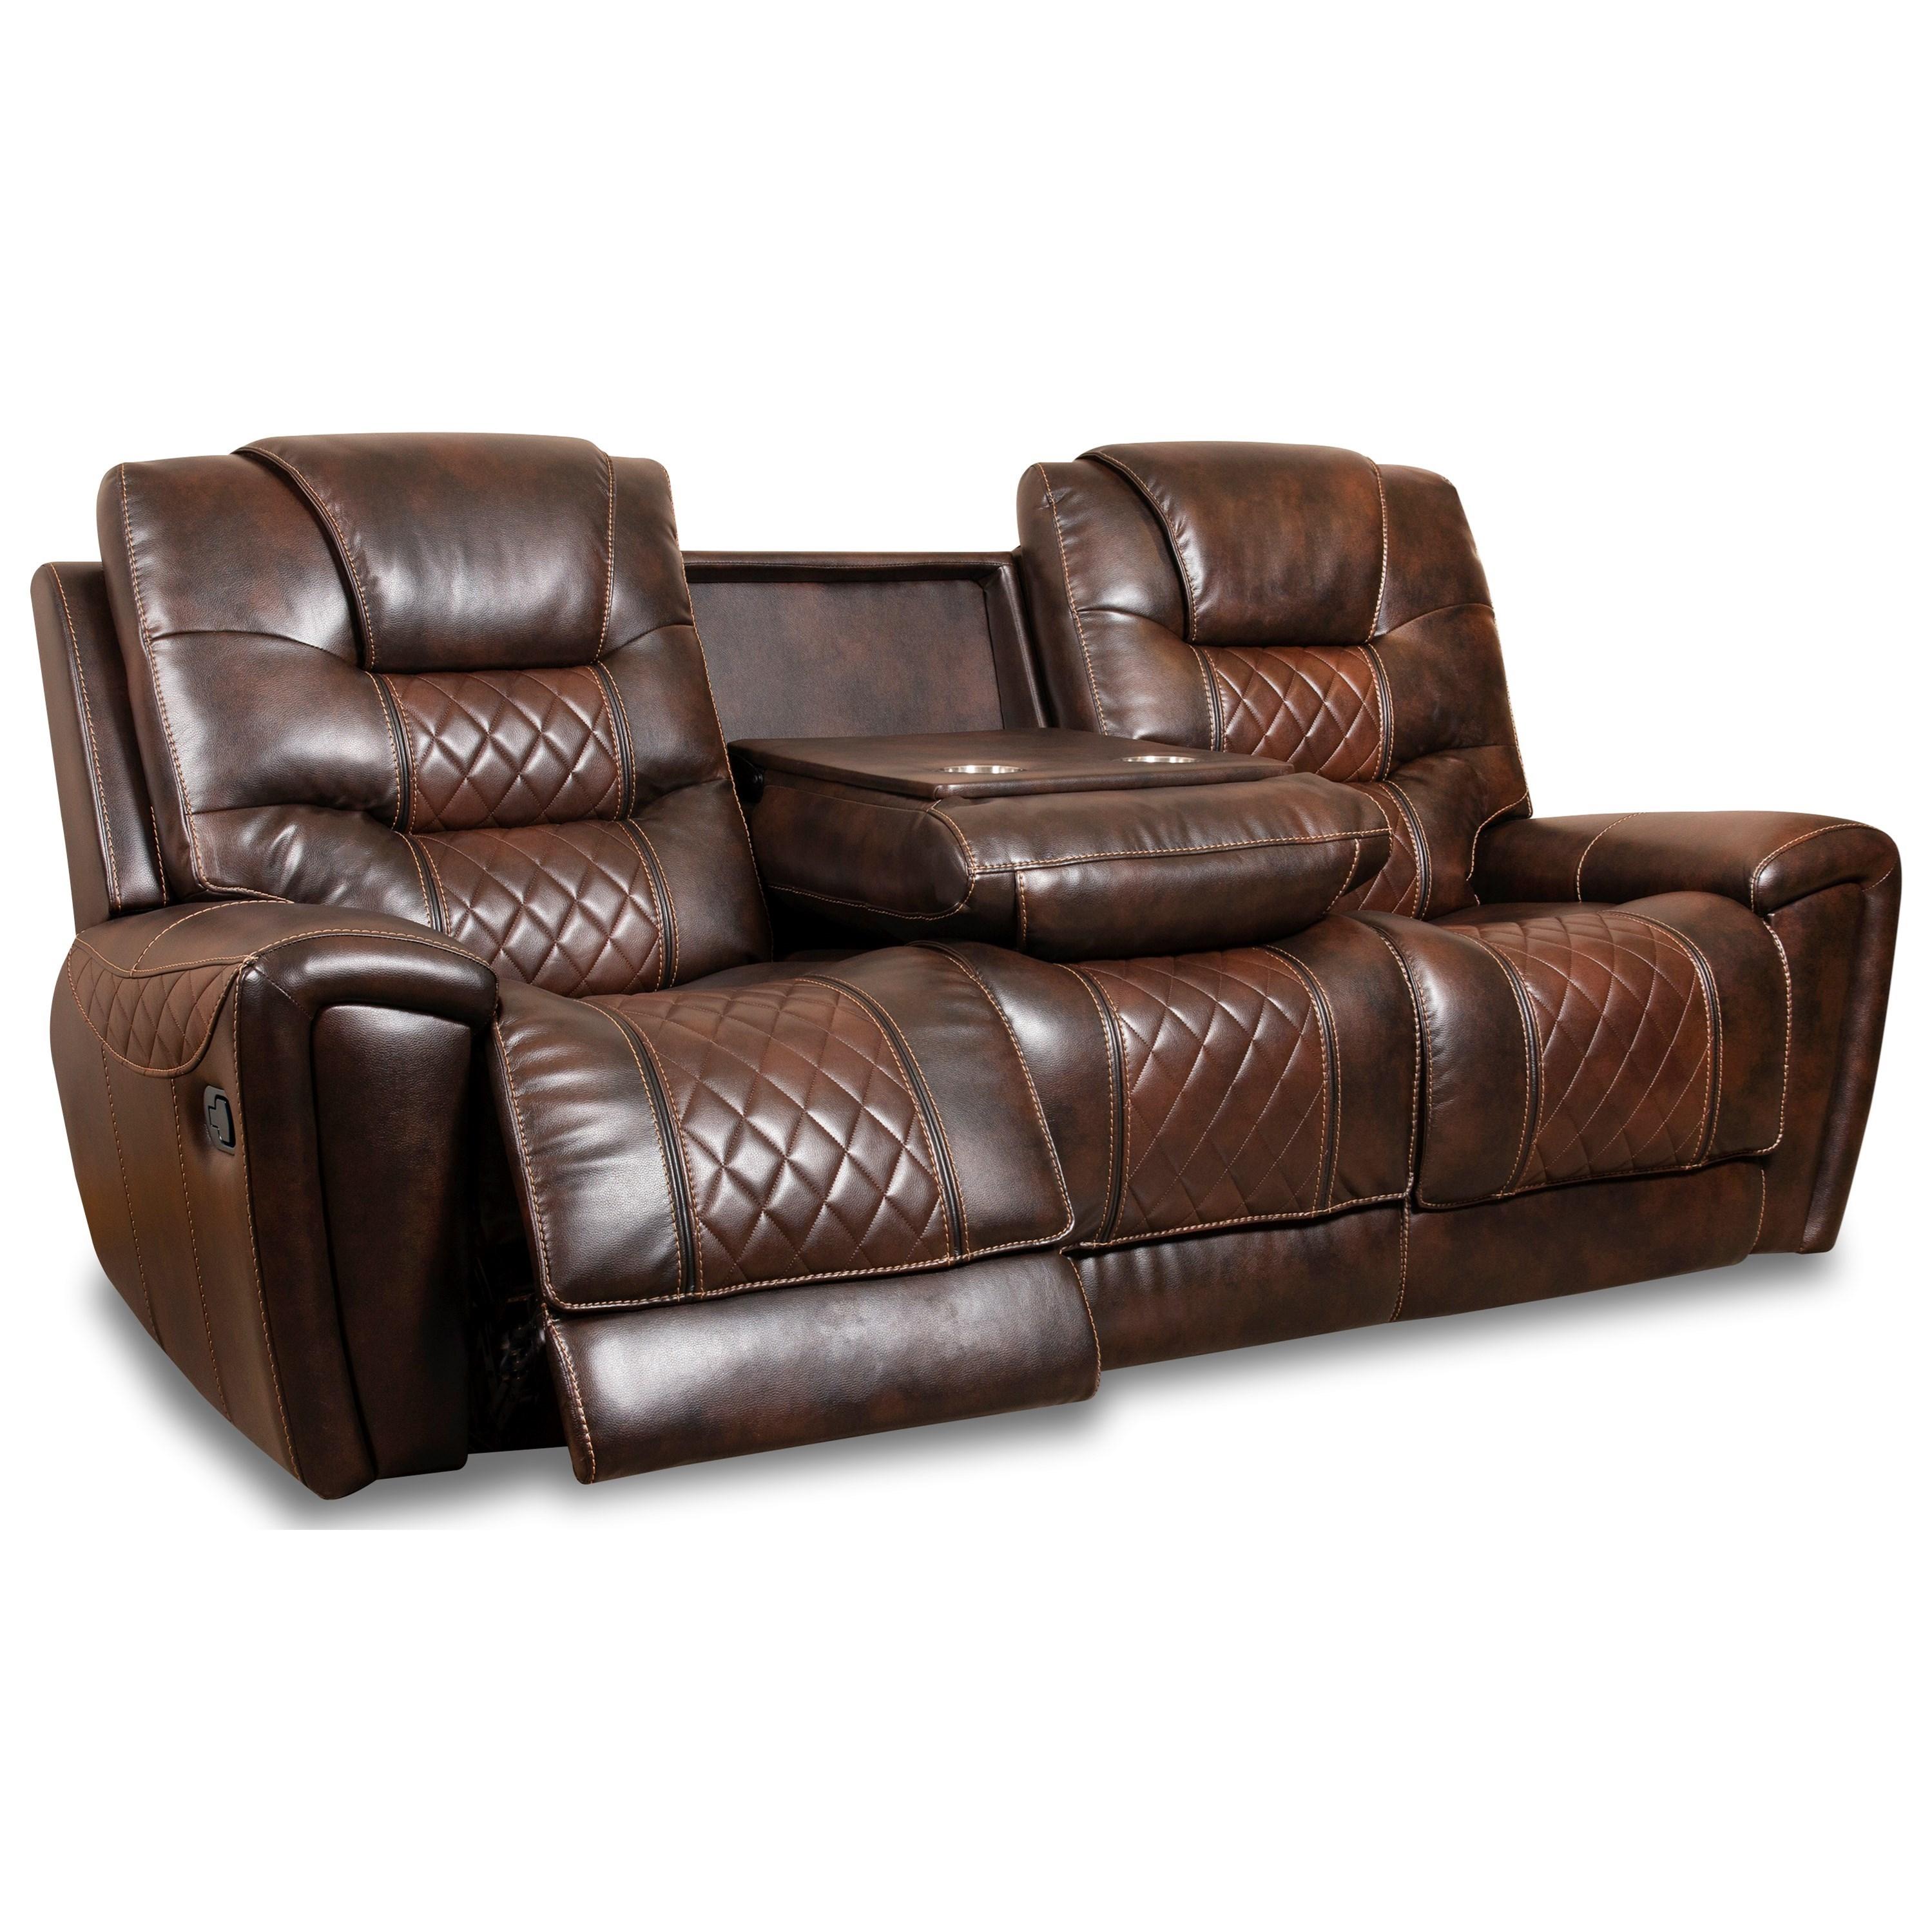 98701 Reclining Sofa at Virginia Furniture Market